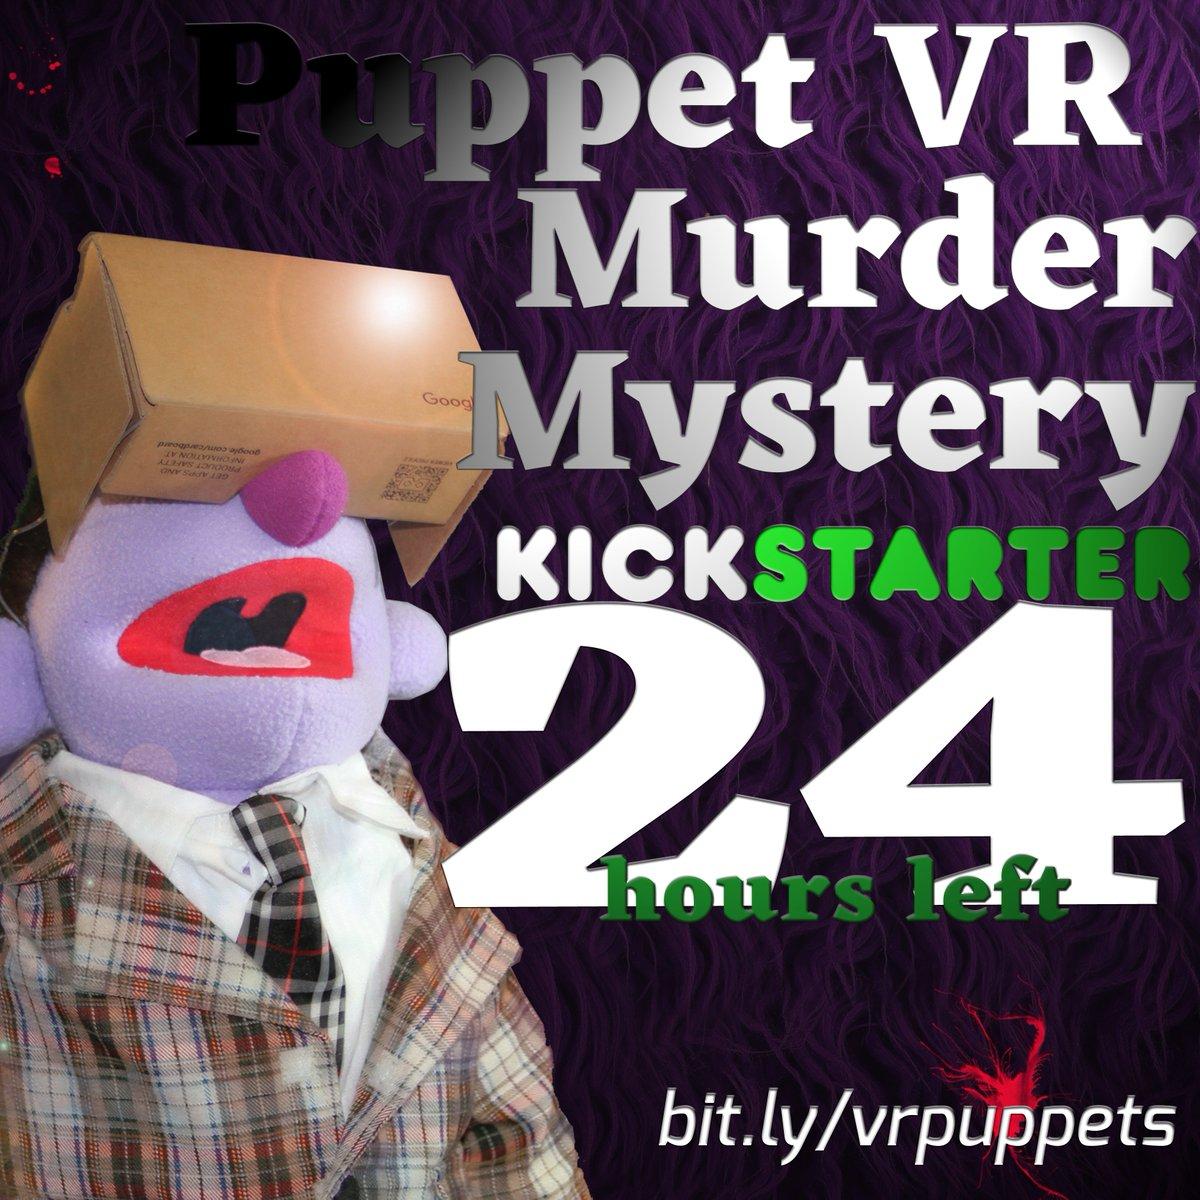 24 hours left on my crazy Kickstarter!! https://t.co/yX7YvbwhVz https://t.co/XjtN0hO5Q6